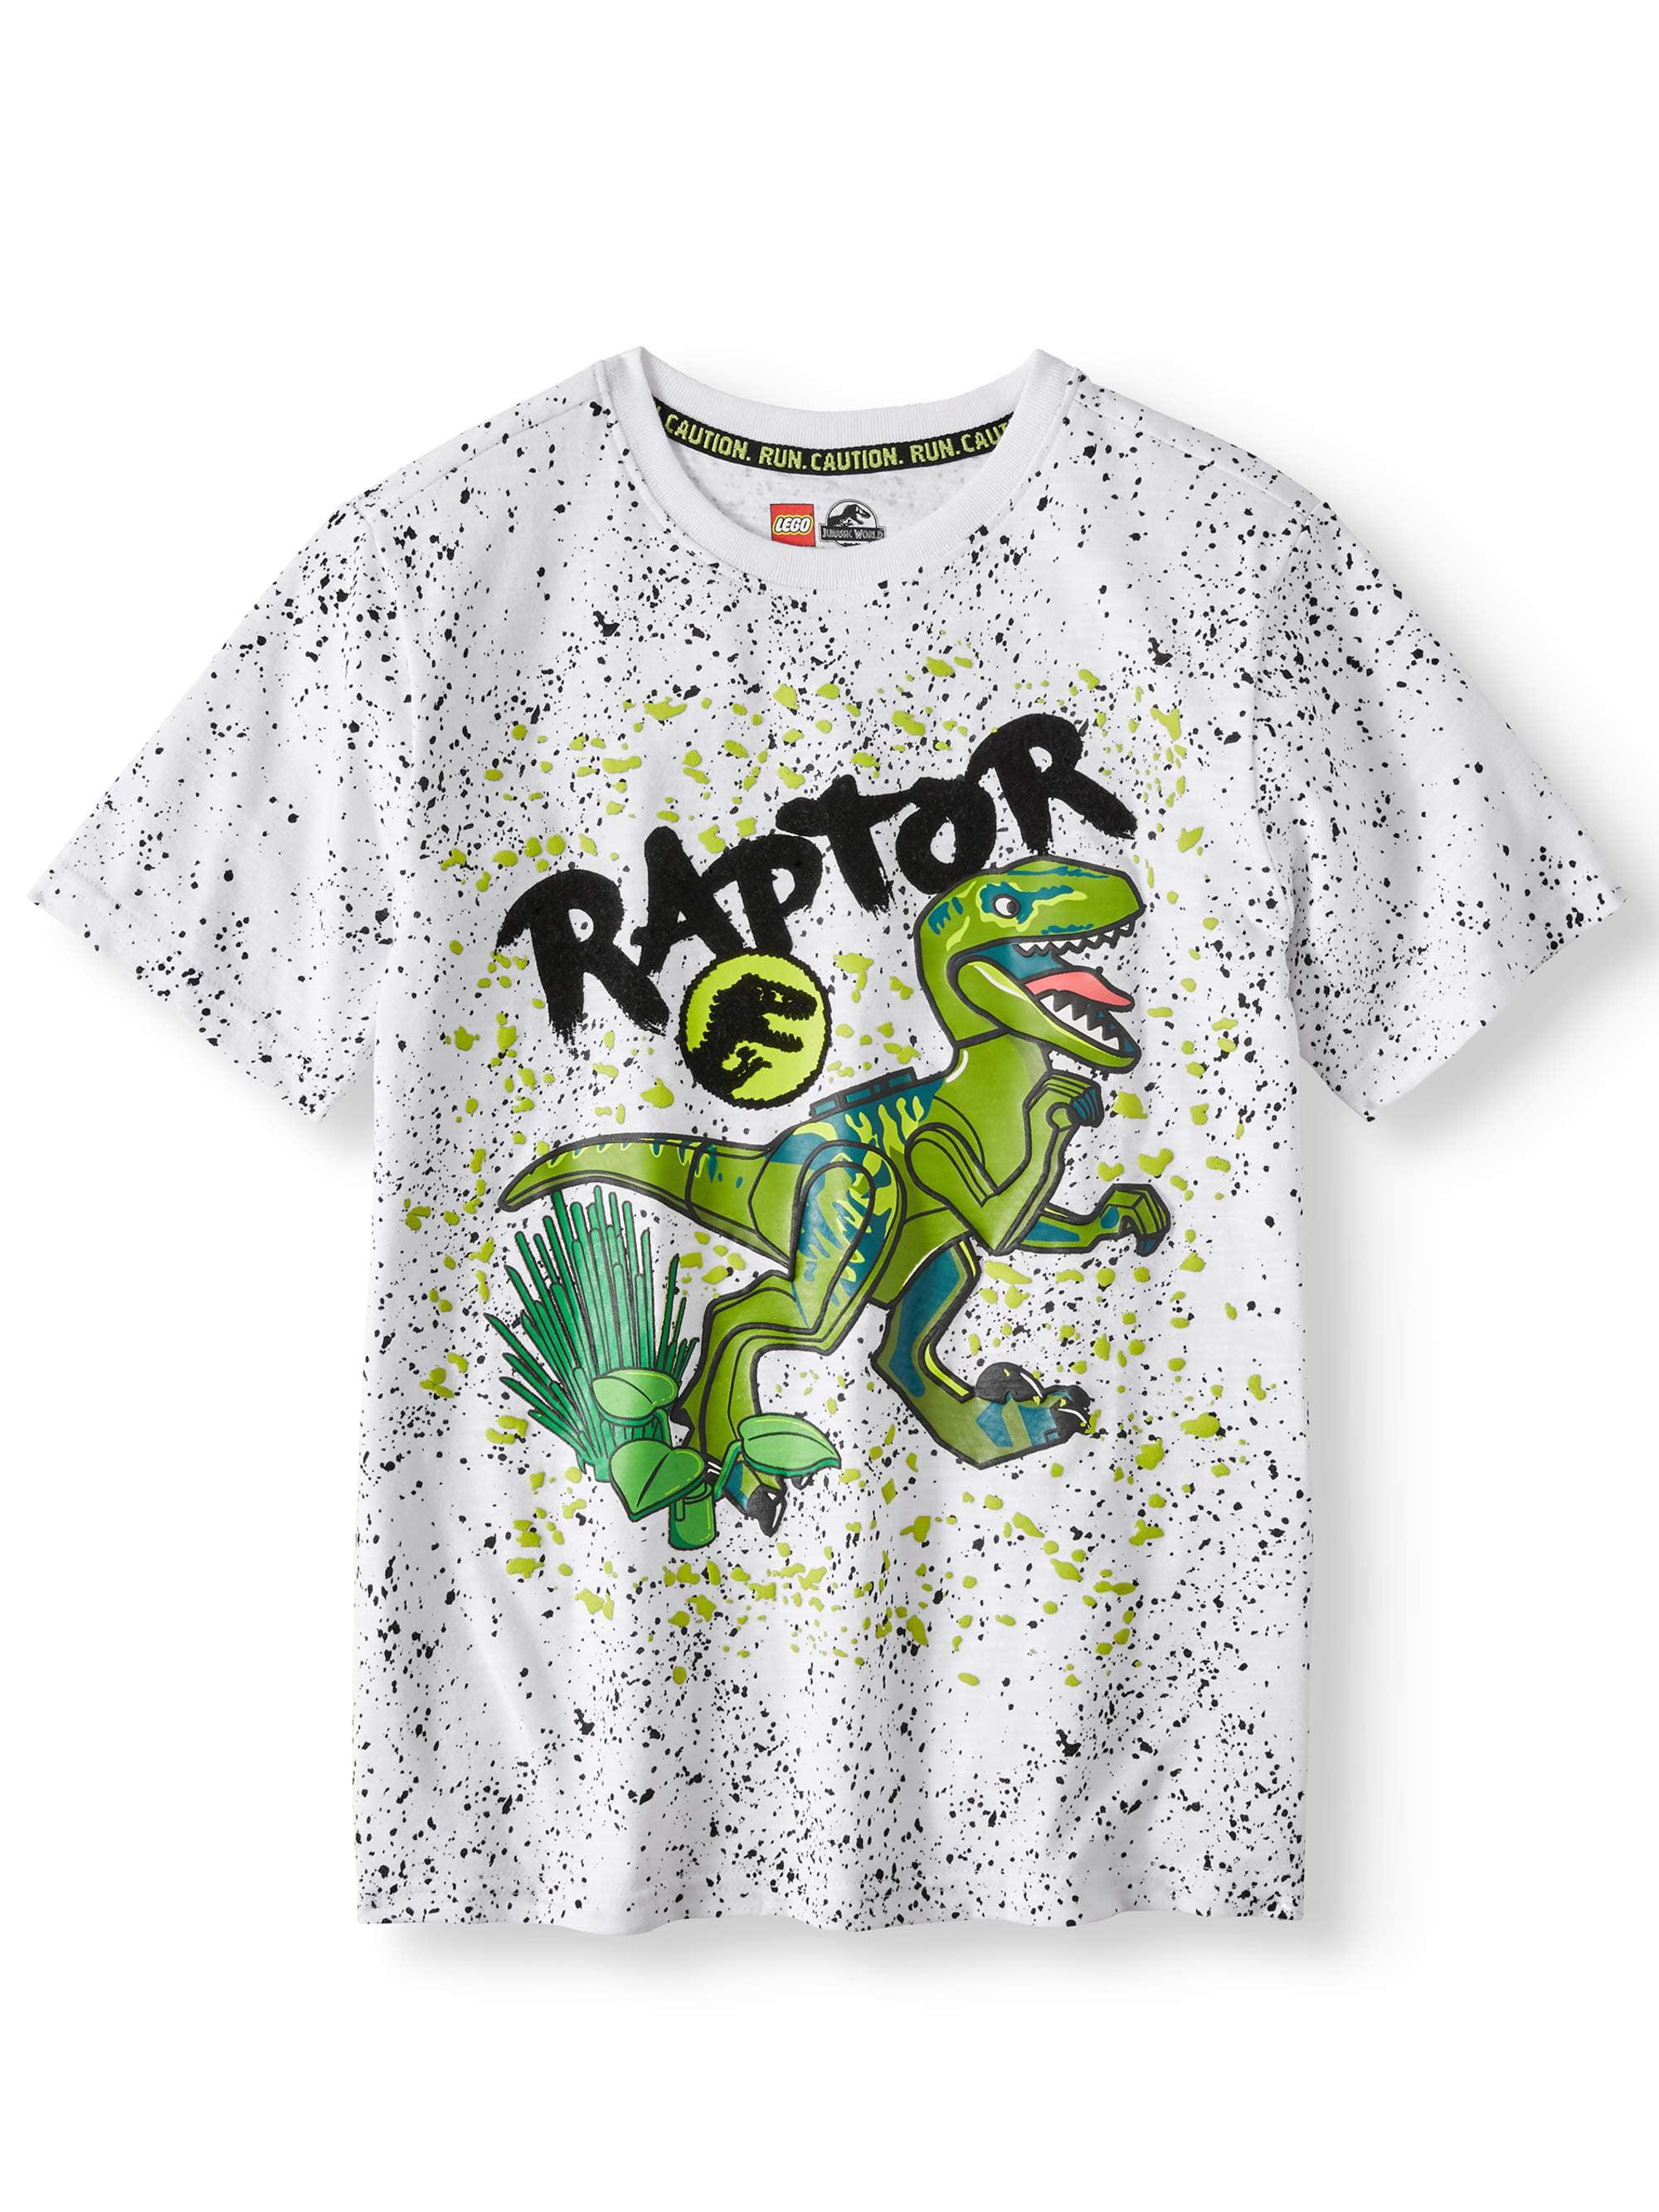 ab4e0741 LEGO - Jurassic World Raptor Short Sleeve Graphic Tee (Little Boys & Big  Boys) - Walmart.com